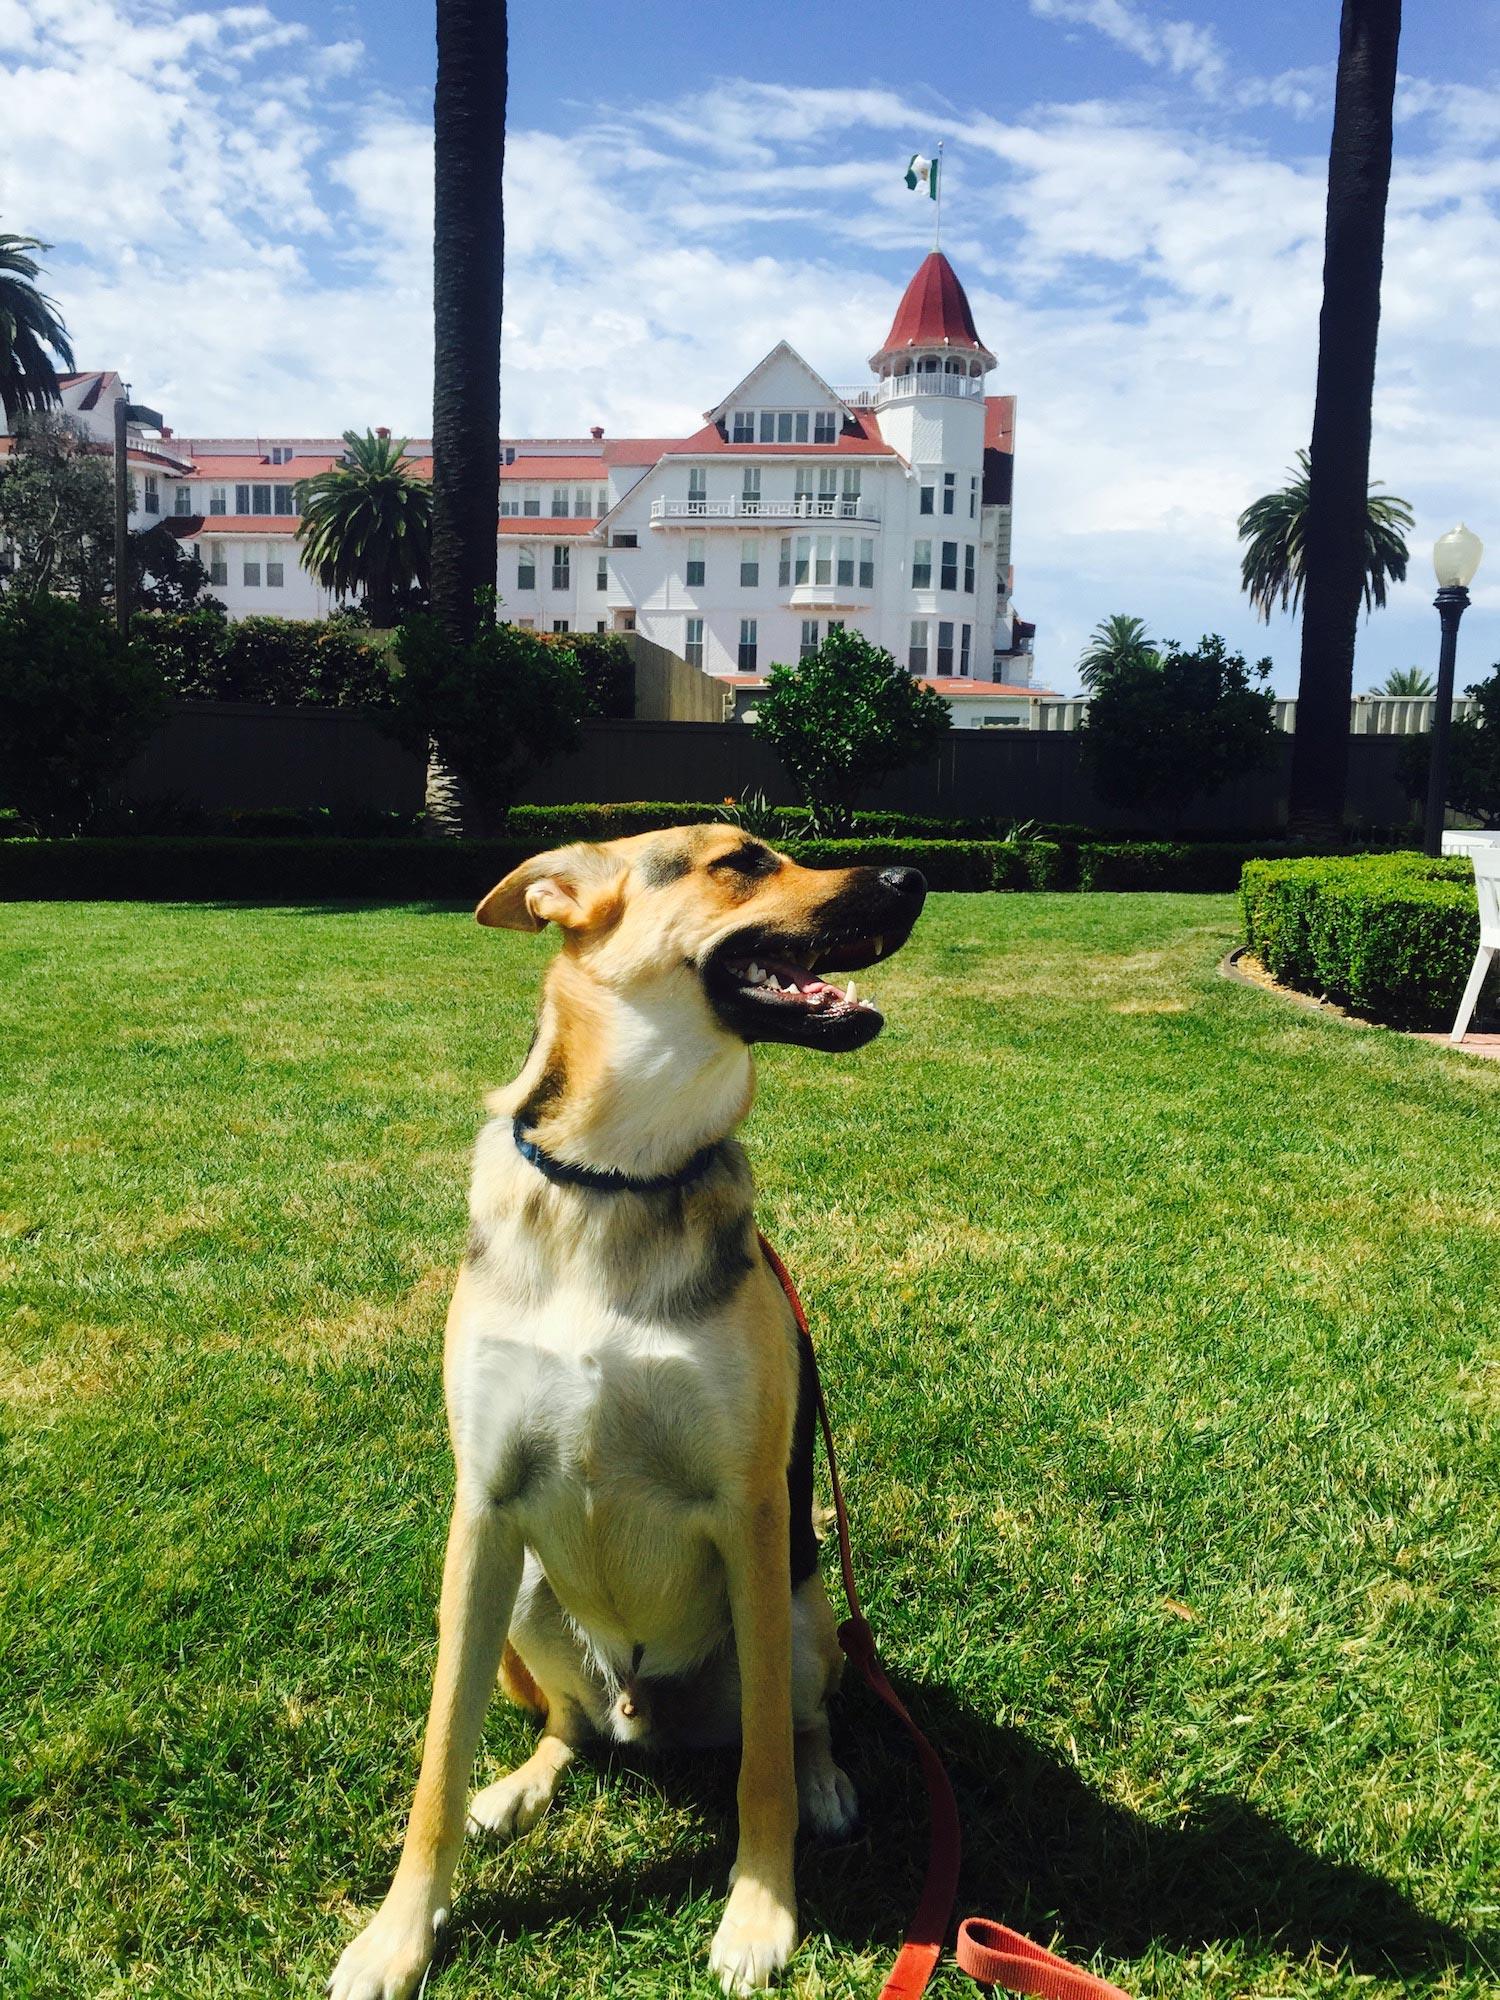 Sapphire & Elm Travel co-founder, Stephanie's Puppy Nephew Roman in front of the hotel del coronado